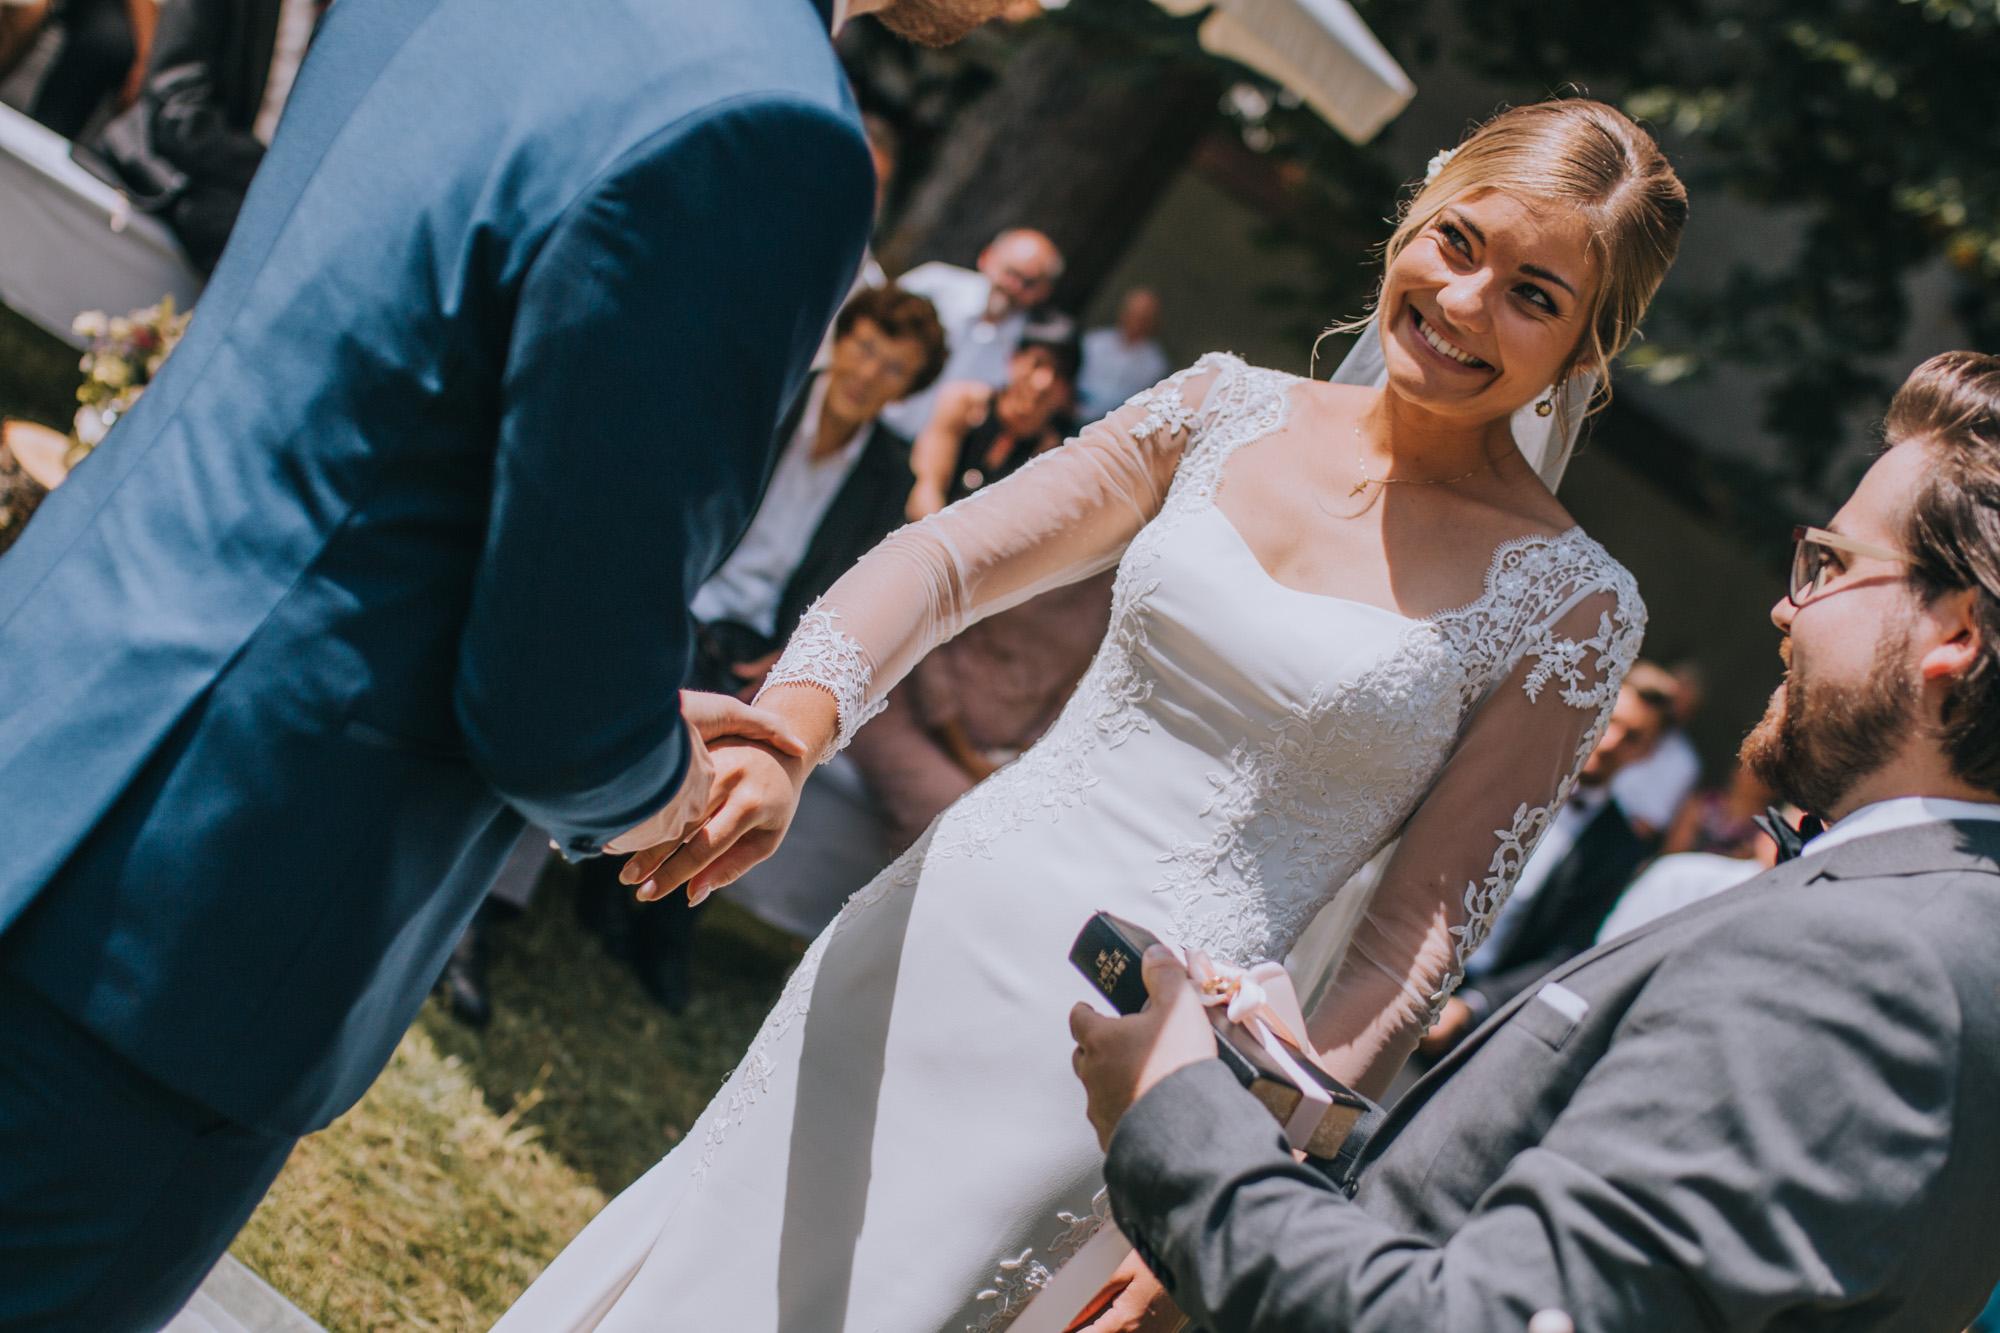 Hochzeit - Memory factory - 20180616-0031.jpg